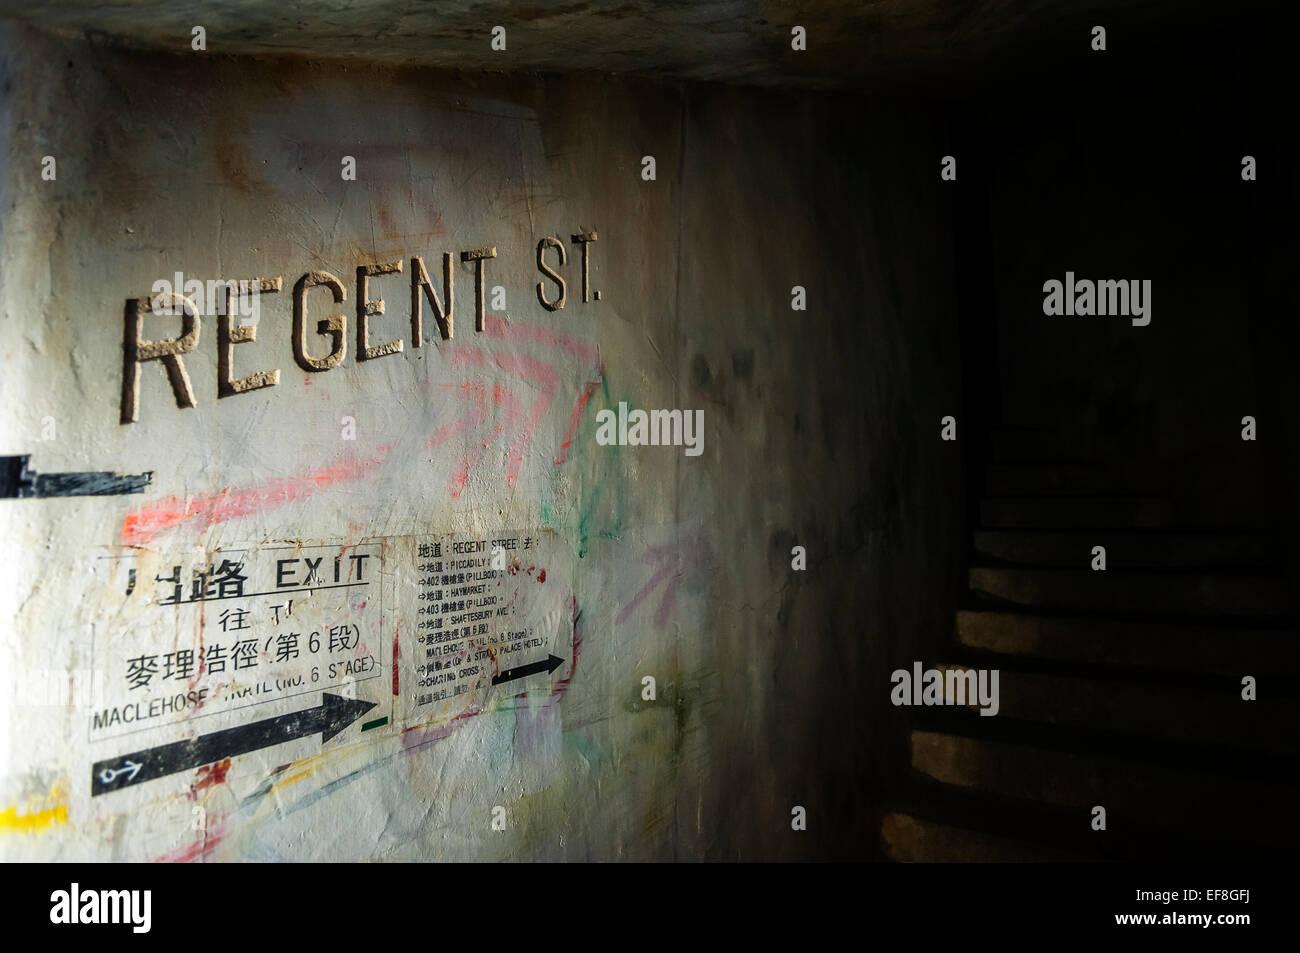 Second World War remnants at Shing Mun Redoubt, Shing Mun Country Park, Hong Kong - Stock Image